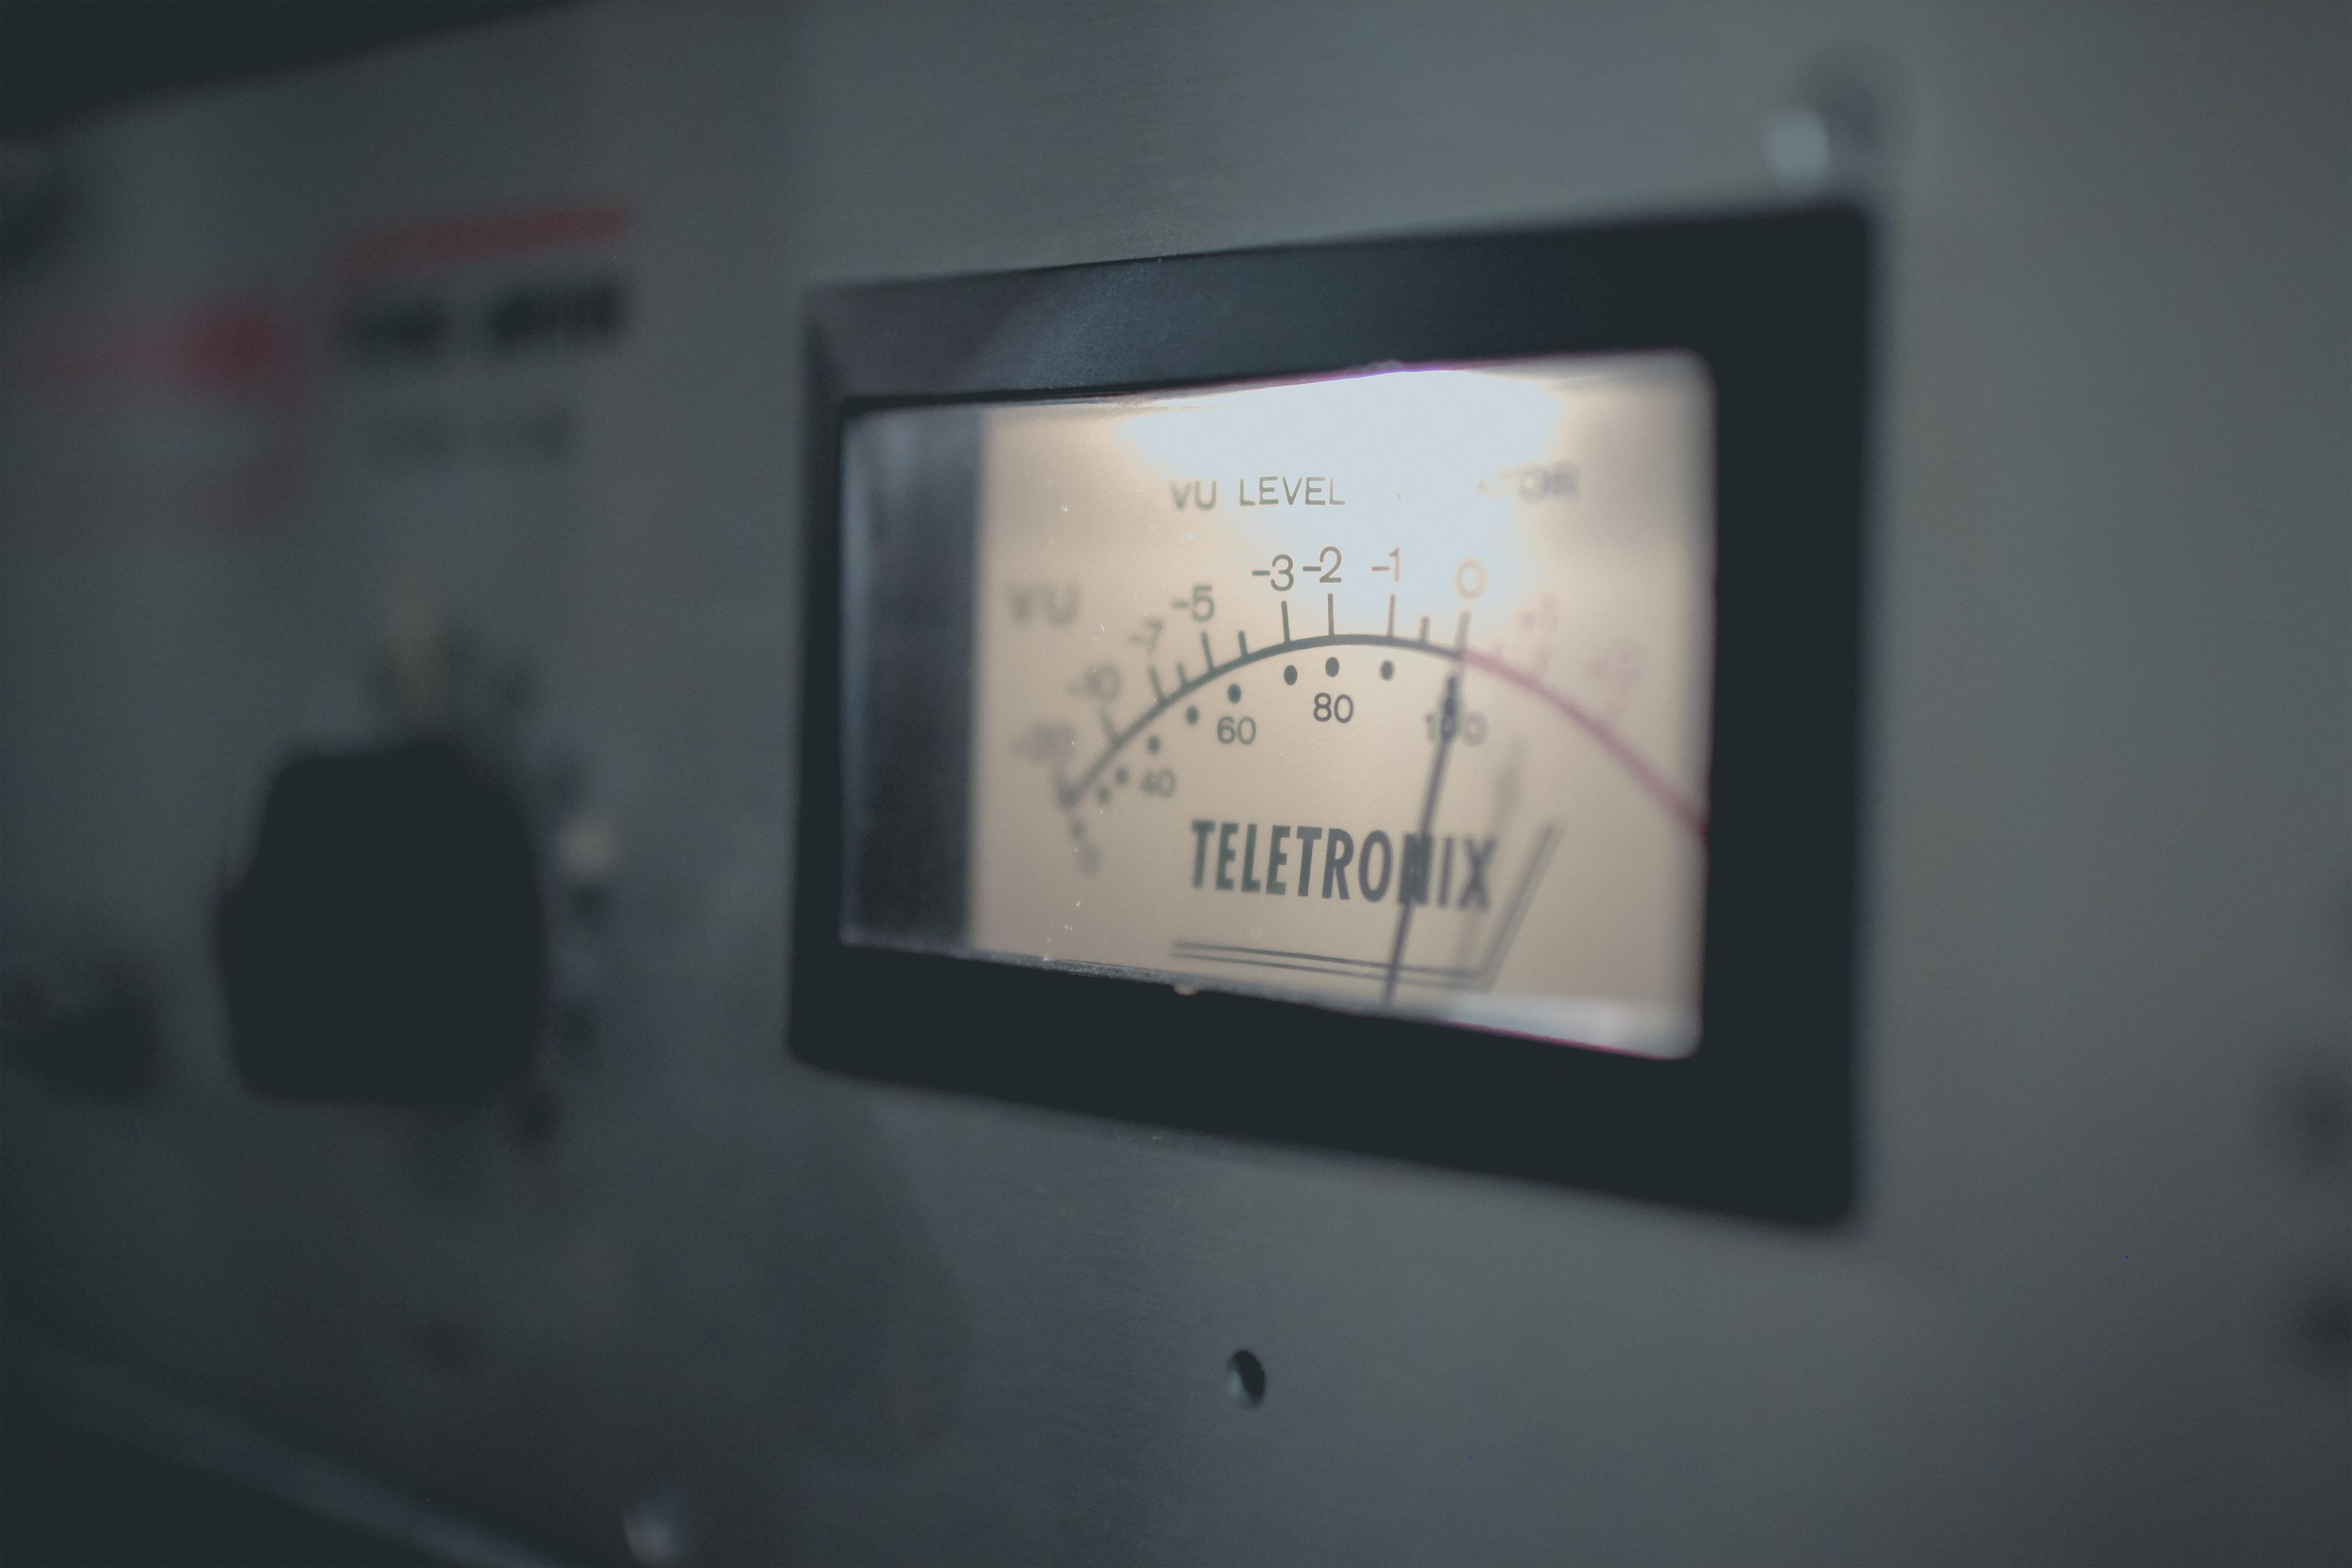 Teletronix